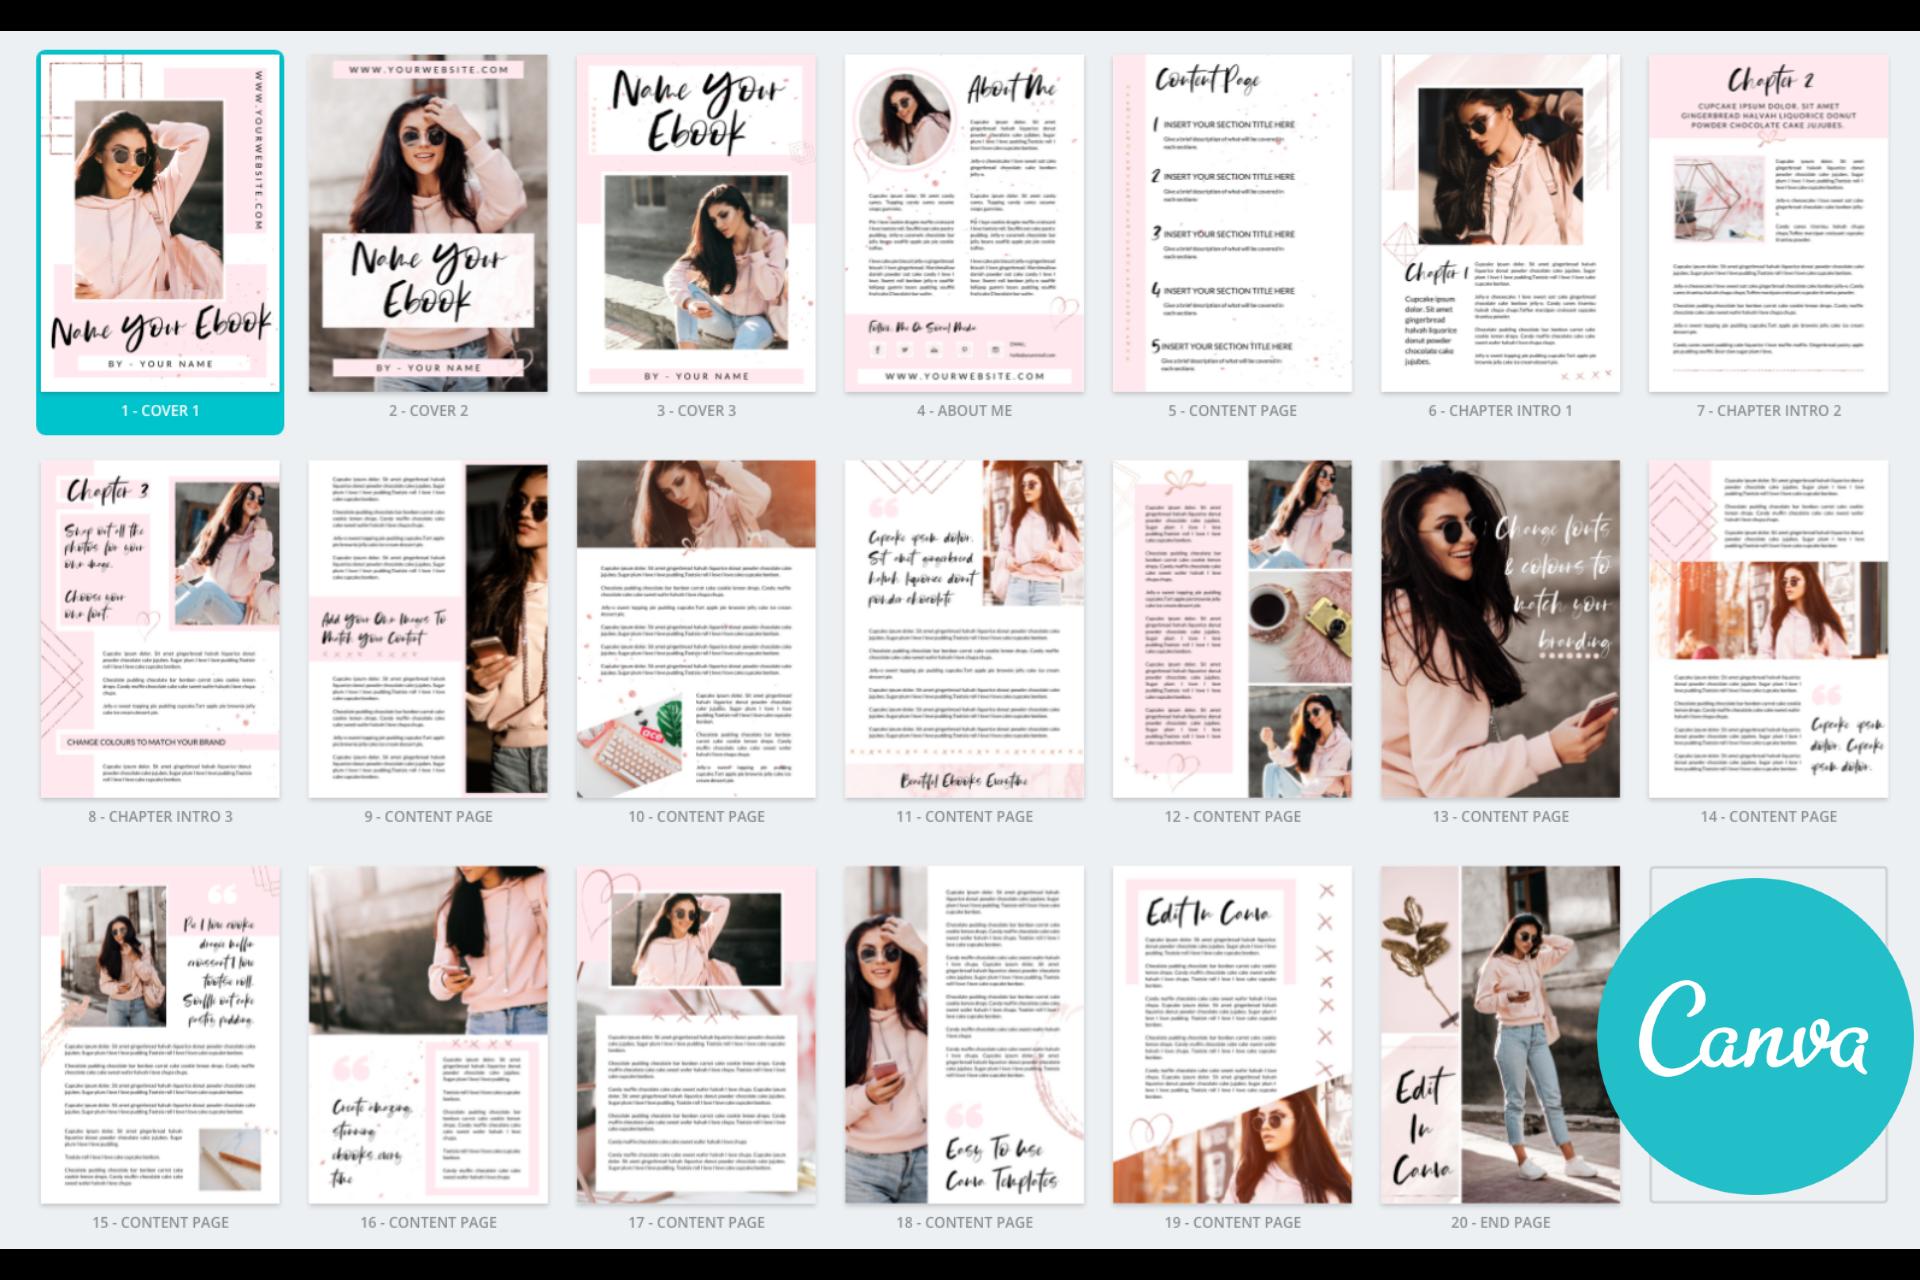 Canva Ready Ebook Template - Diva Dior 9